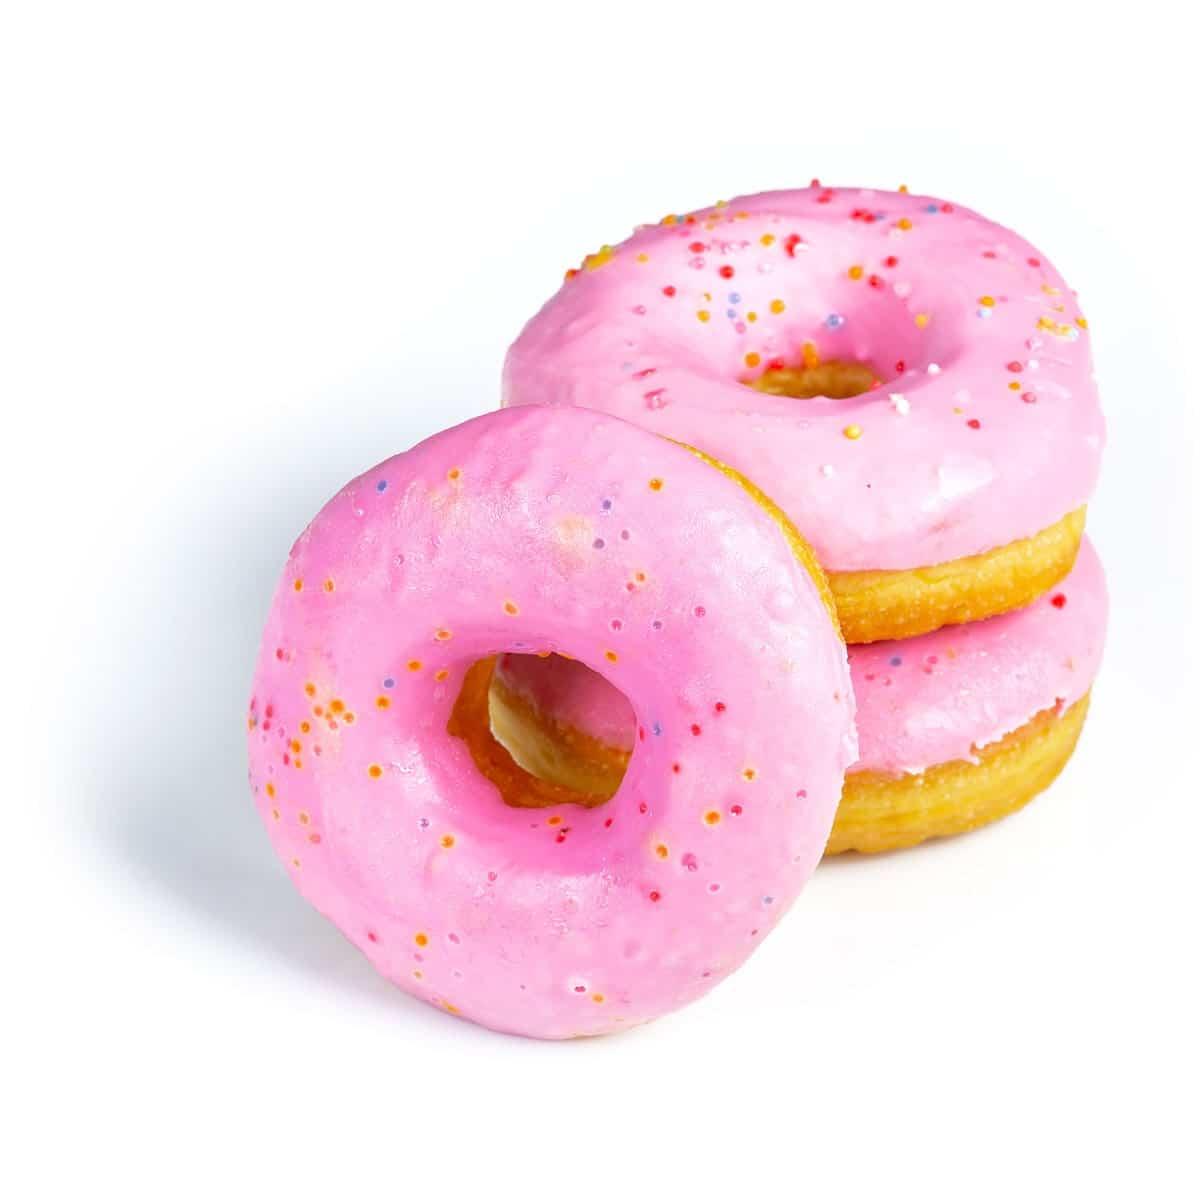 Pinke Donuts mit bunten Sprenklern